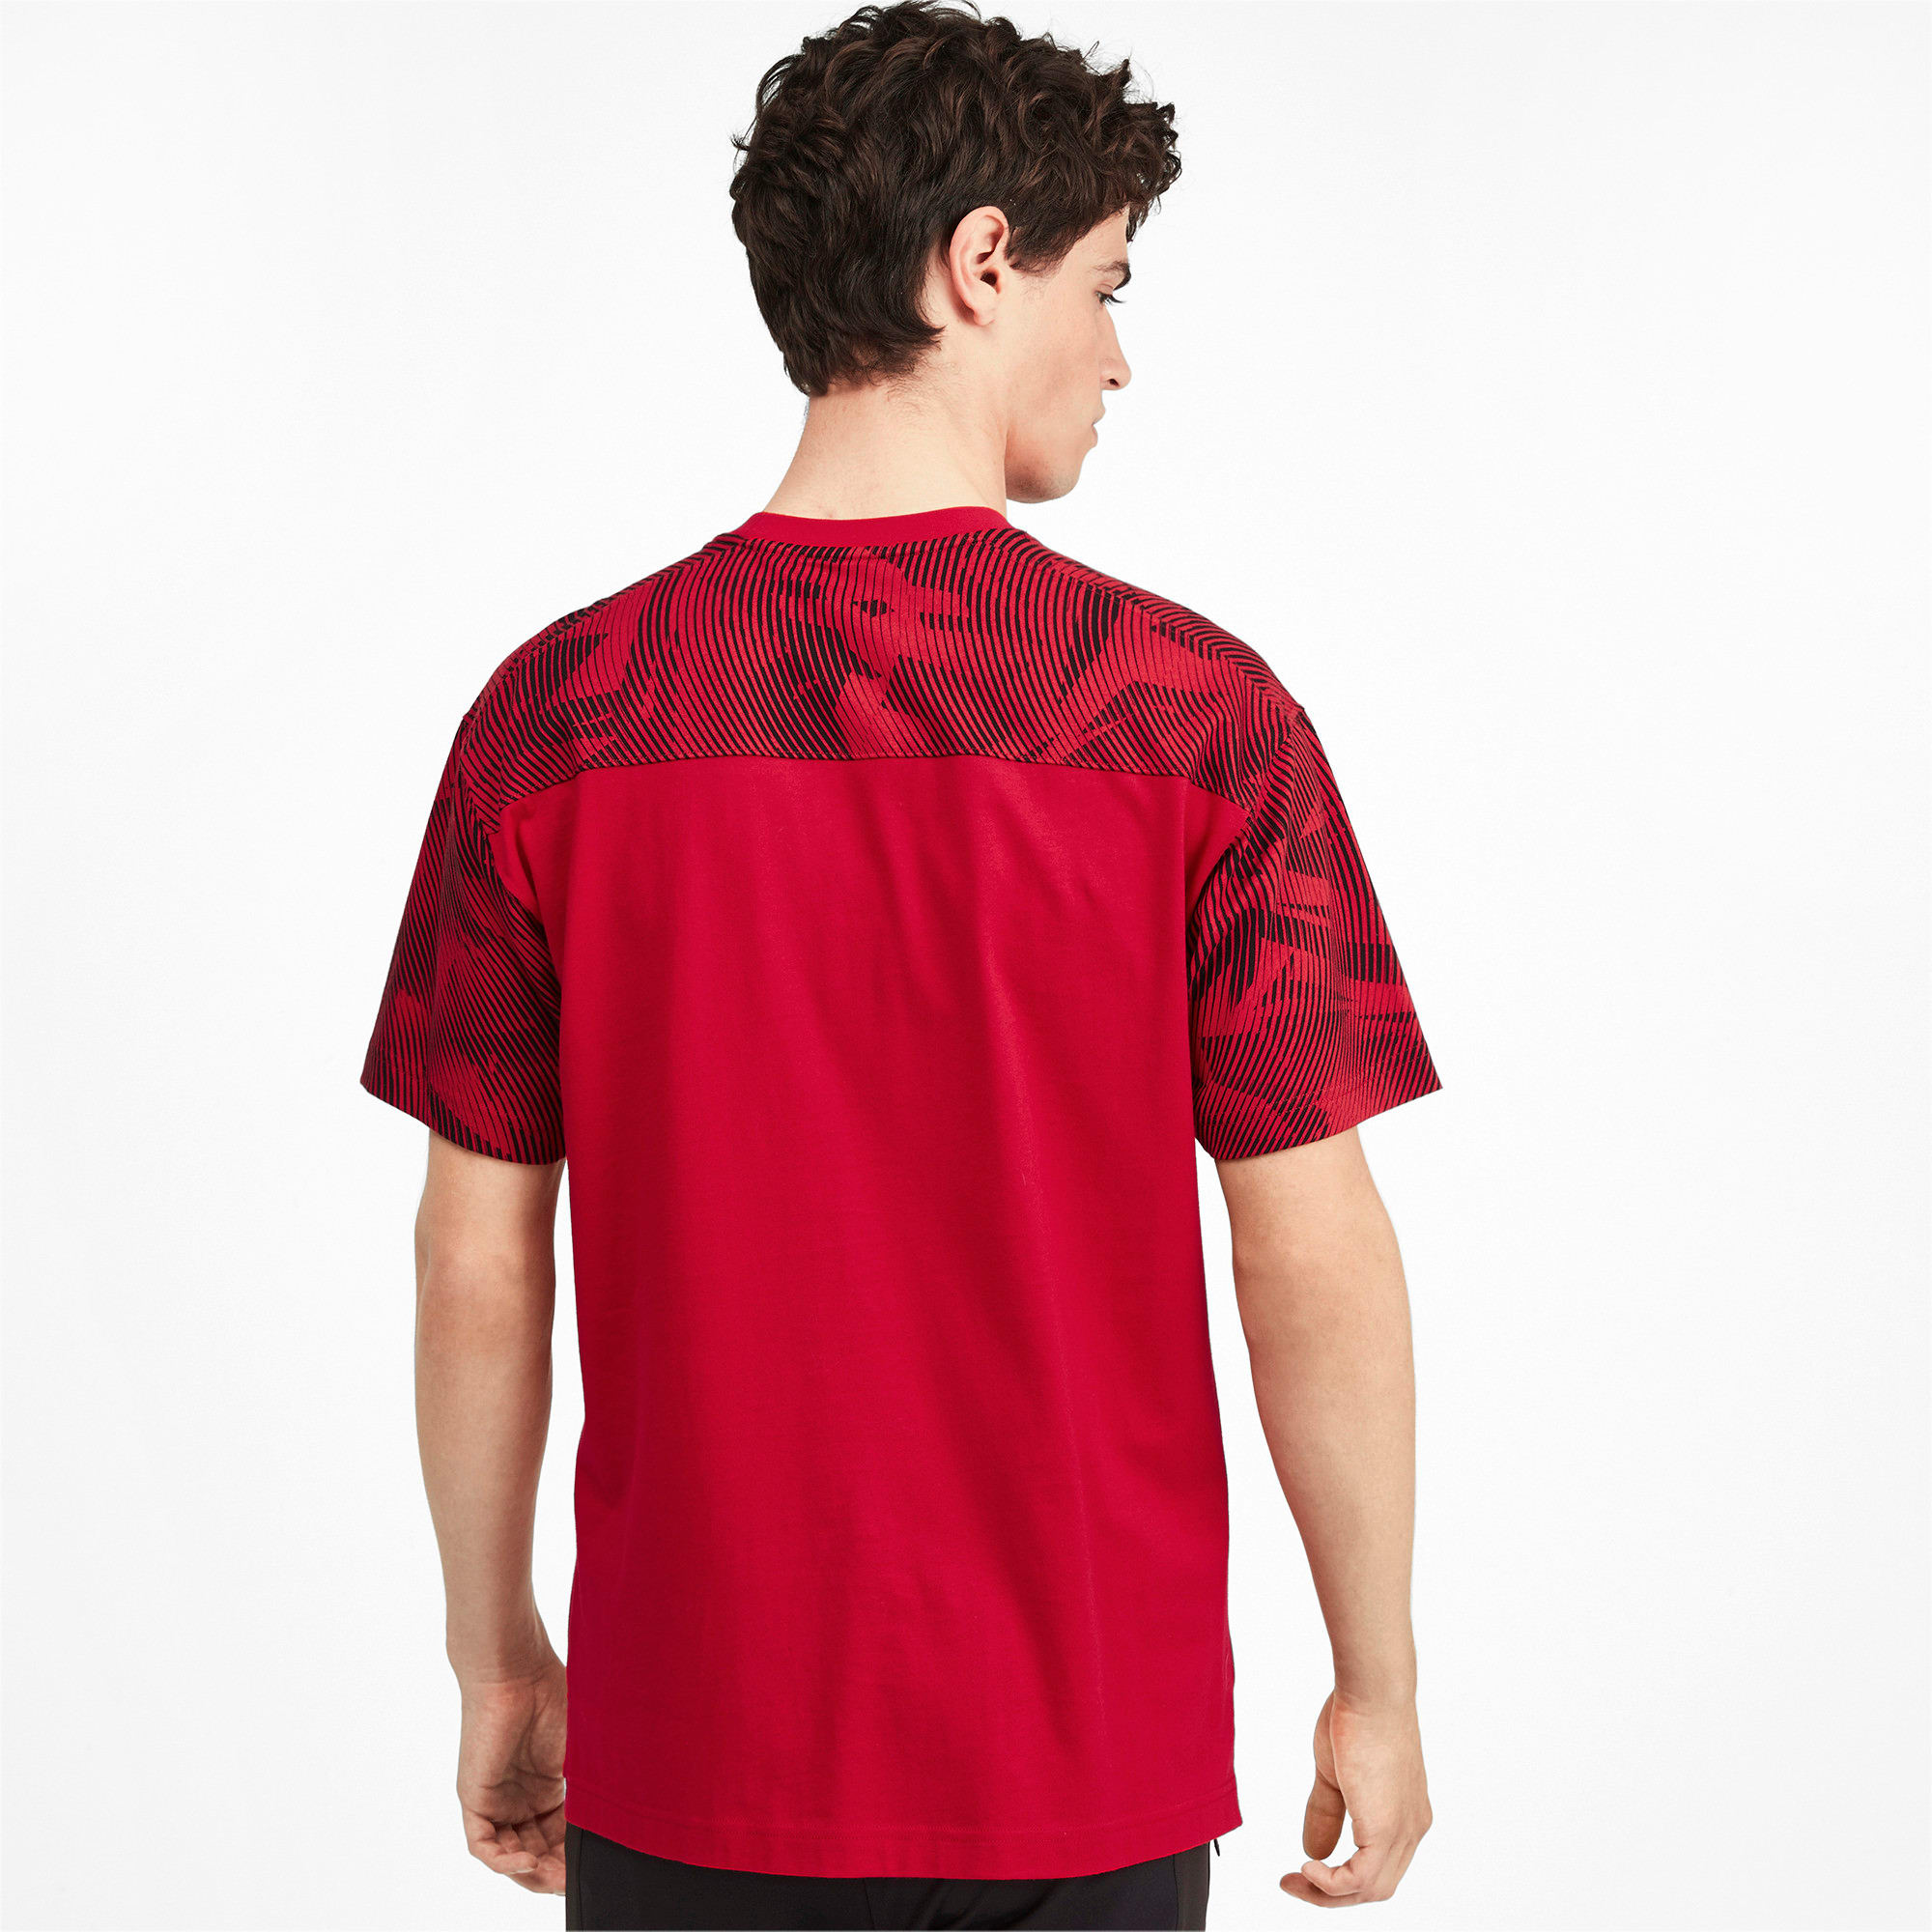 Thumbnail 2 of AC Milan Casuals Men's Tee, Tango Red -Puma Black, medium